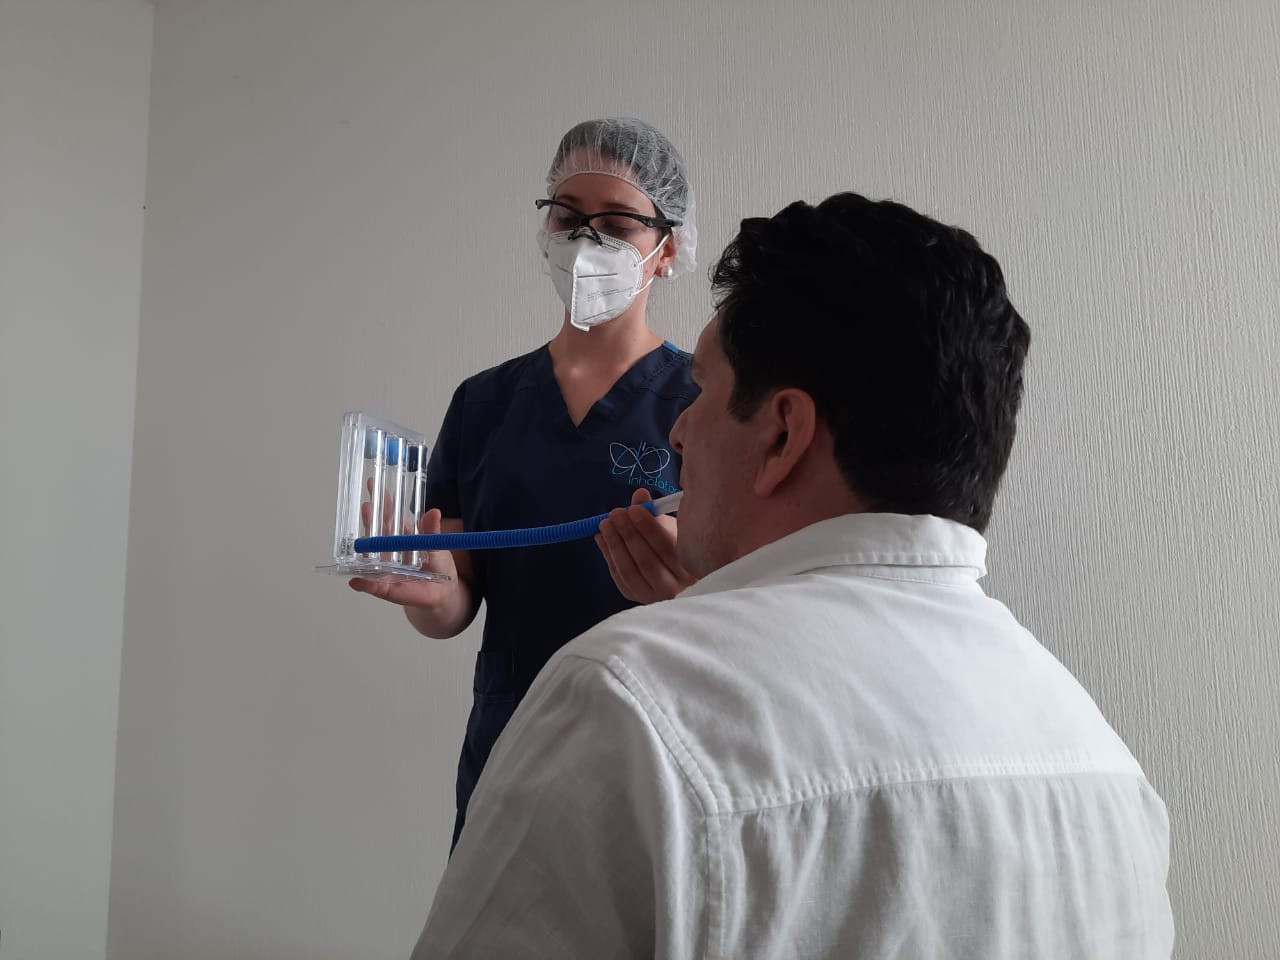 Terapia de rehabilitación pulmonar